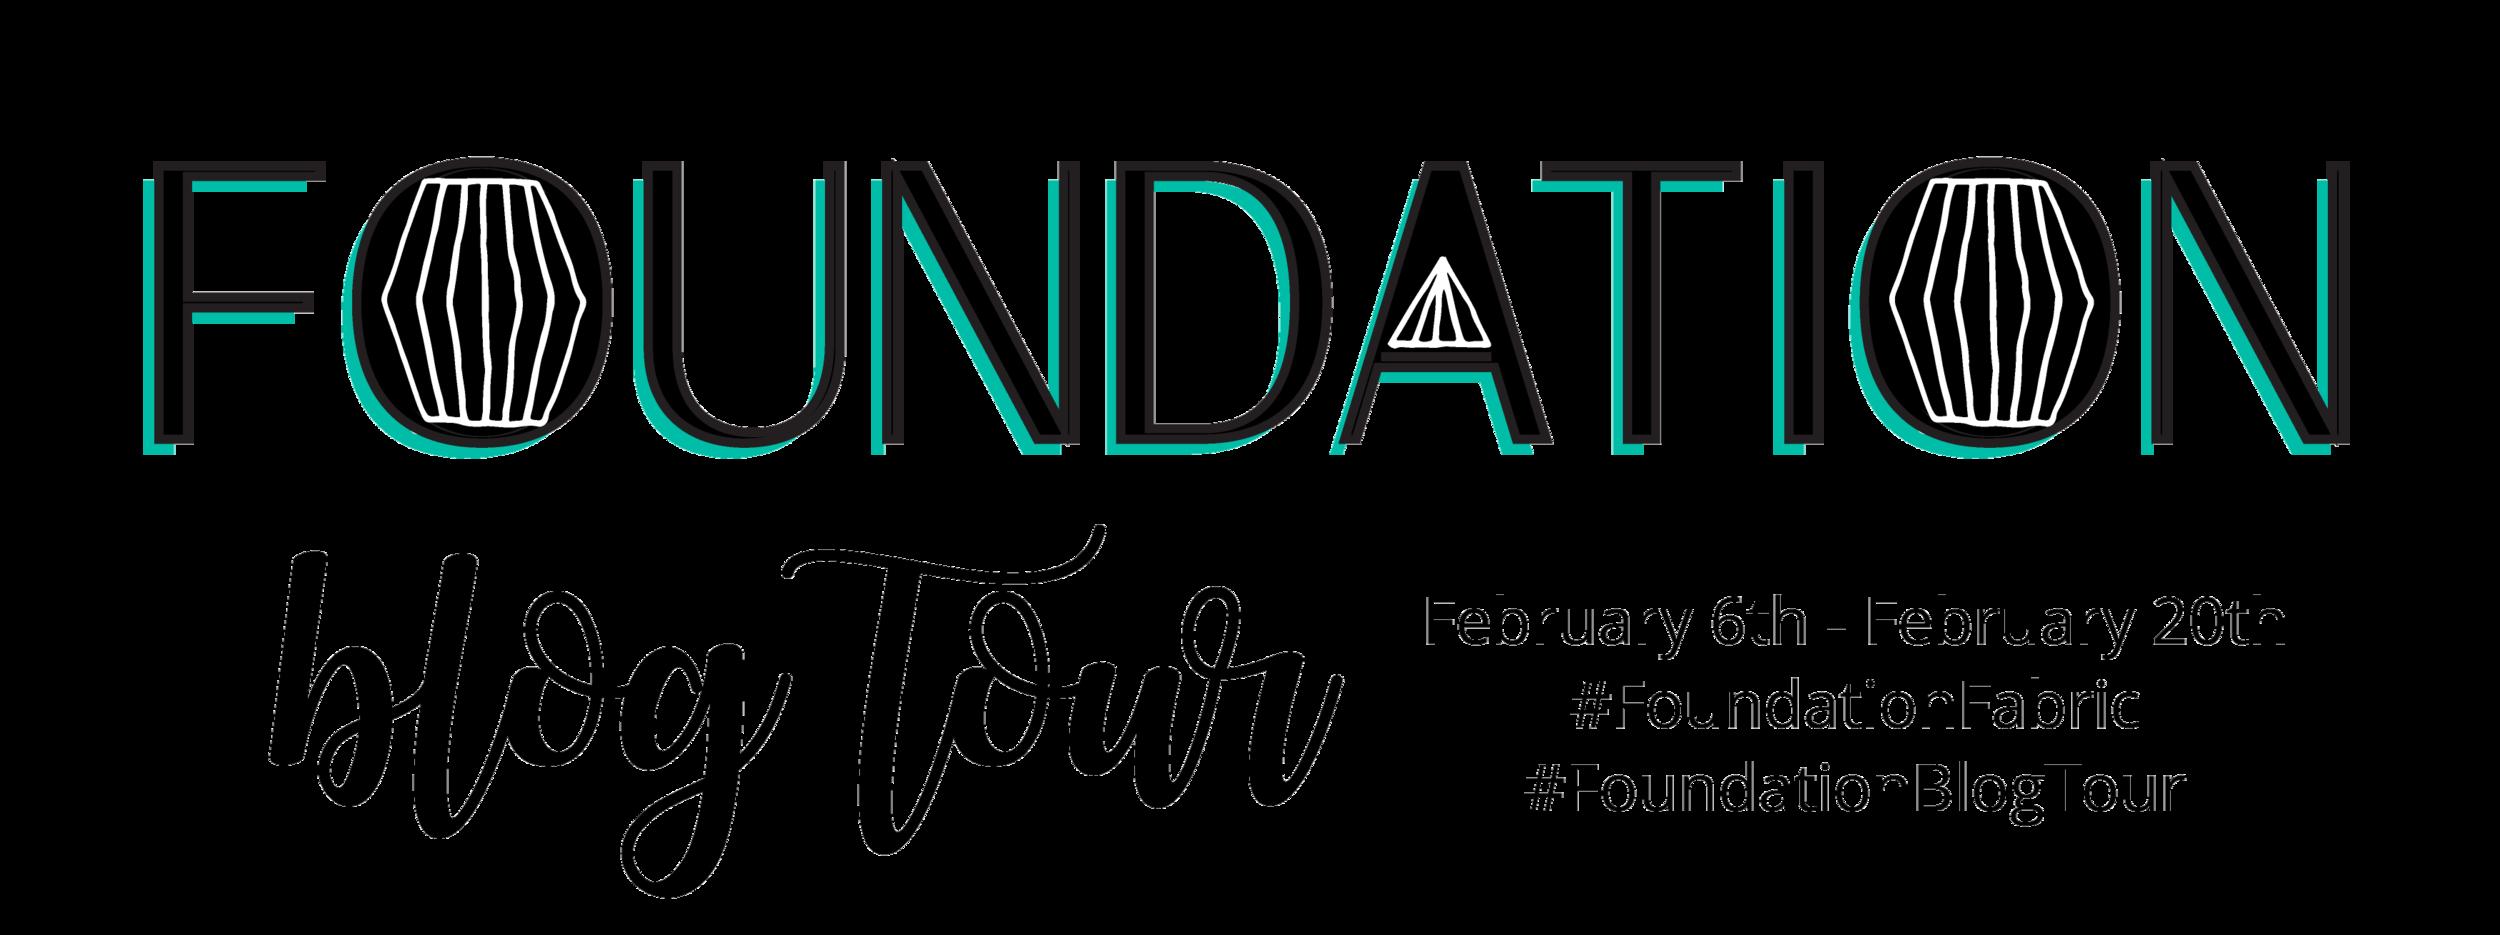 Foundation-Blog-tour2.png